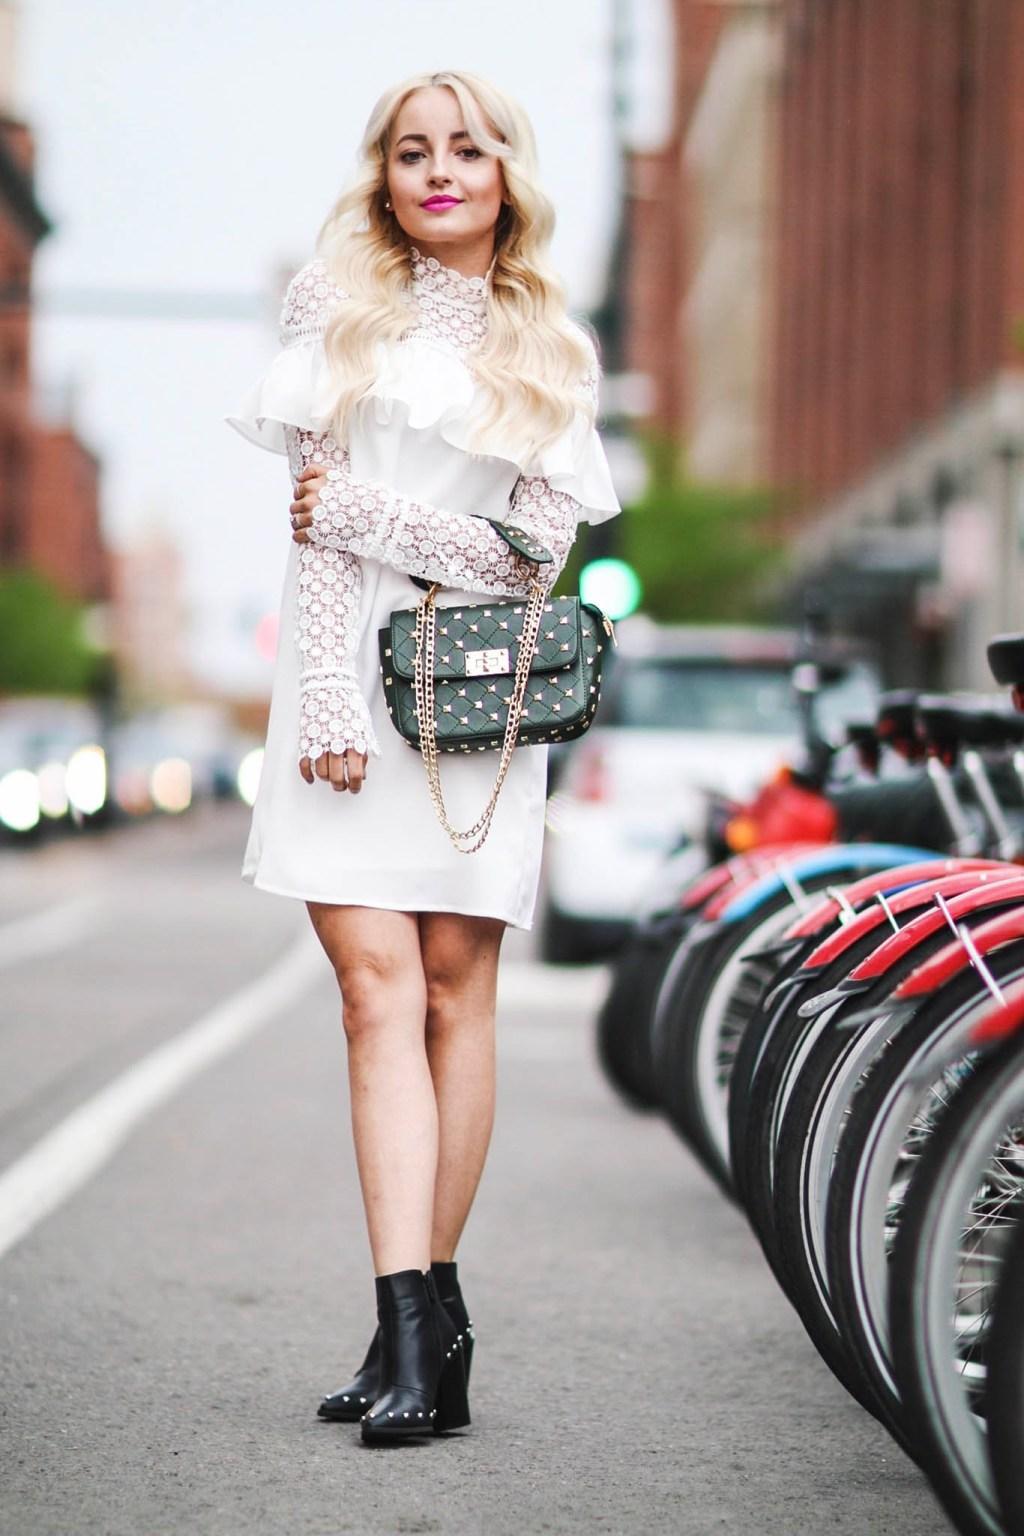 Alena Gidenko of modaprints.com shares her favorite white dresses for Spring and Summer